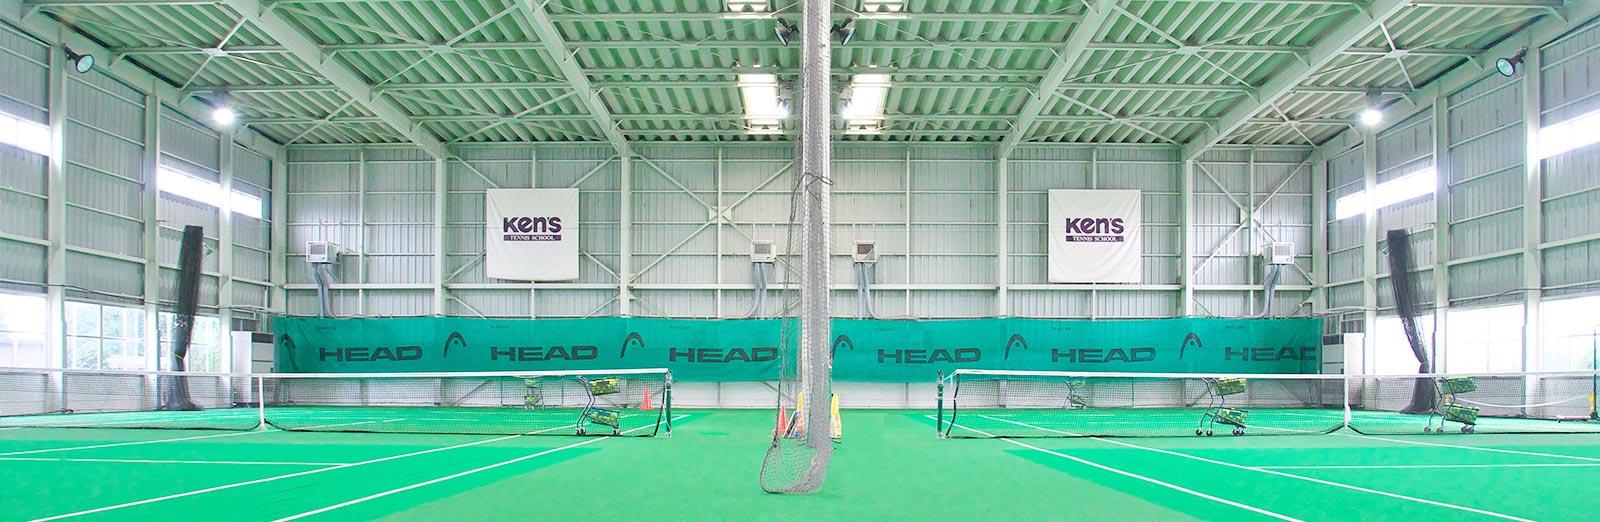 Ken'sインドアテニススクール四街道